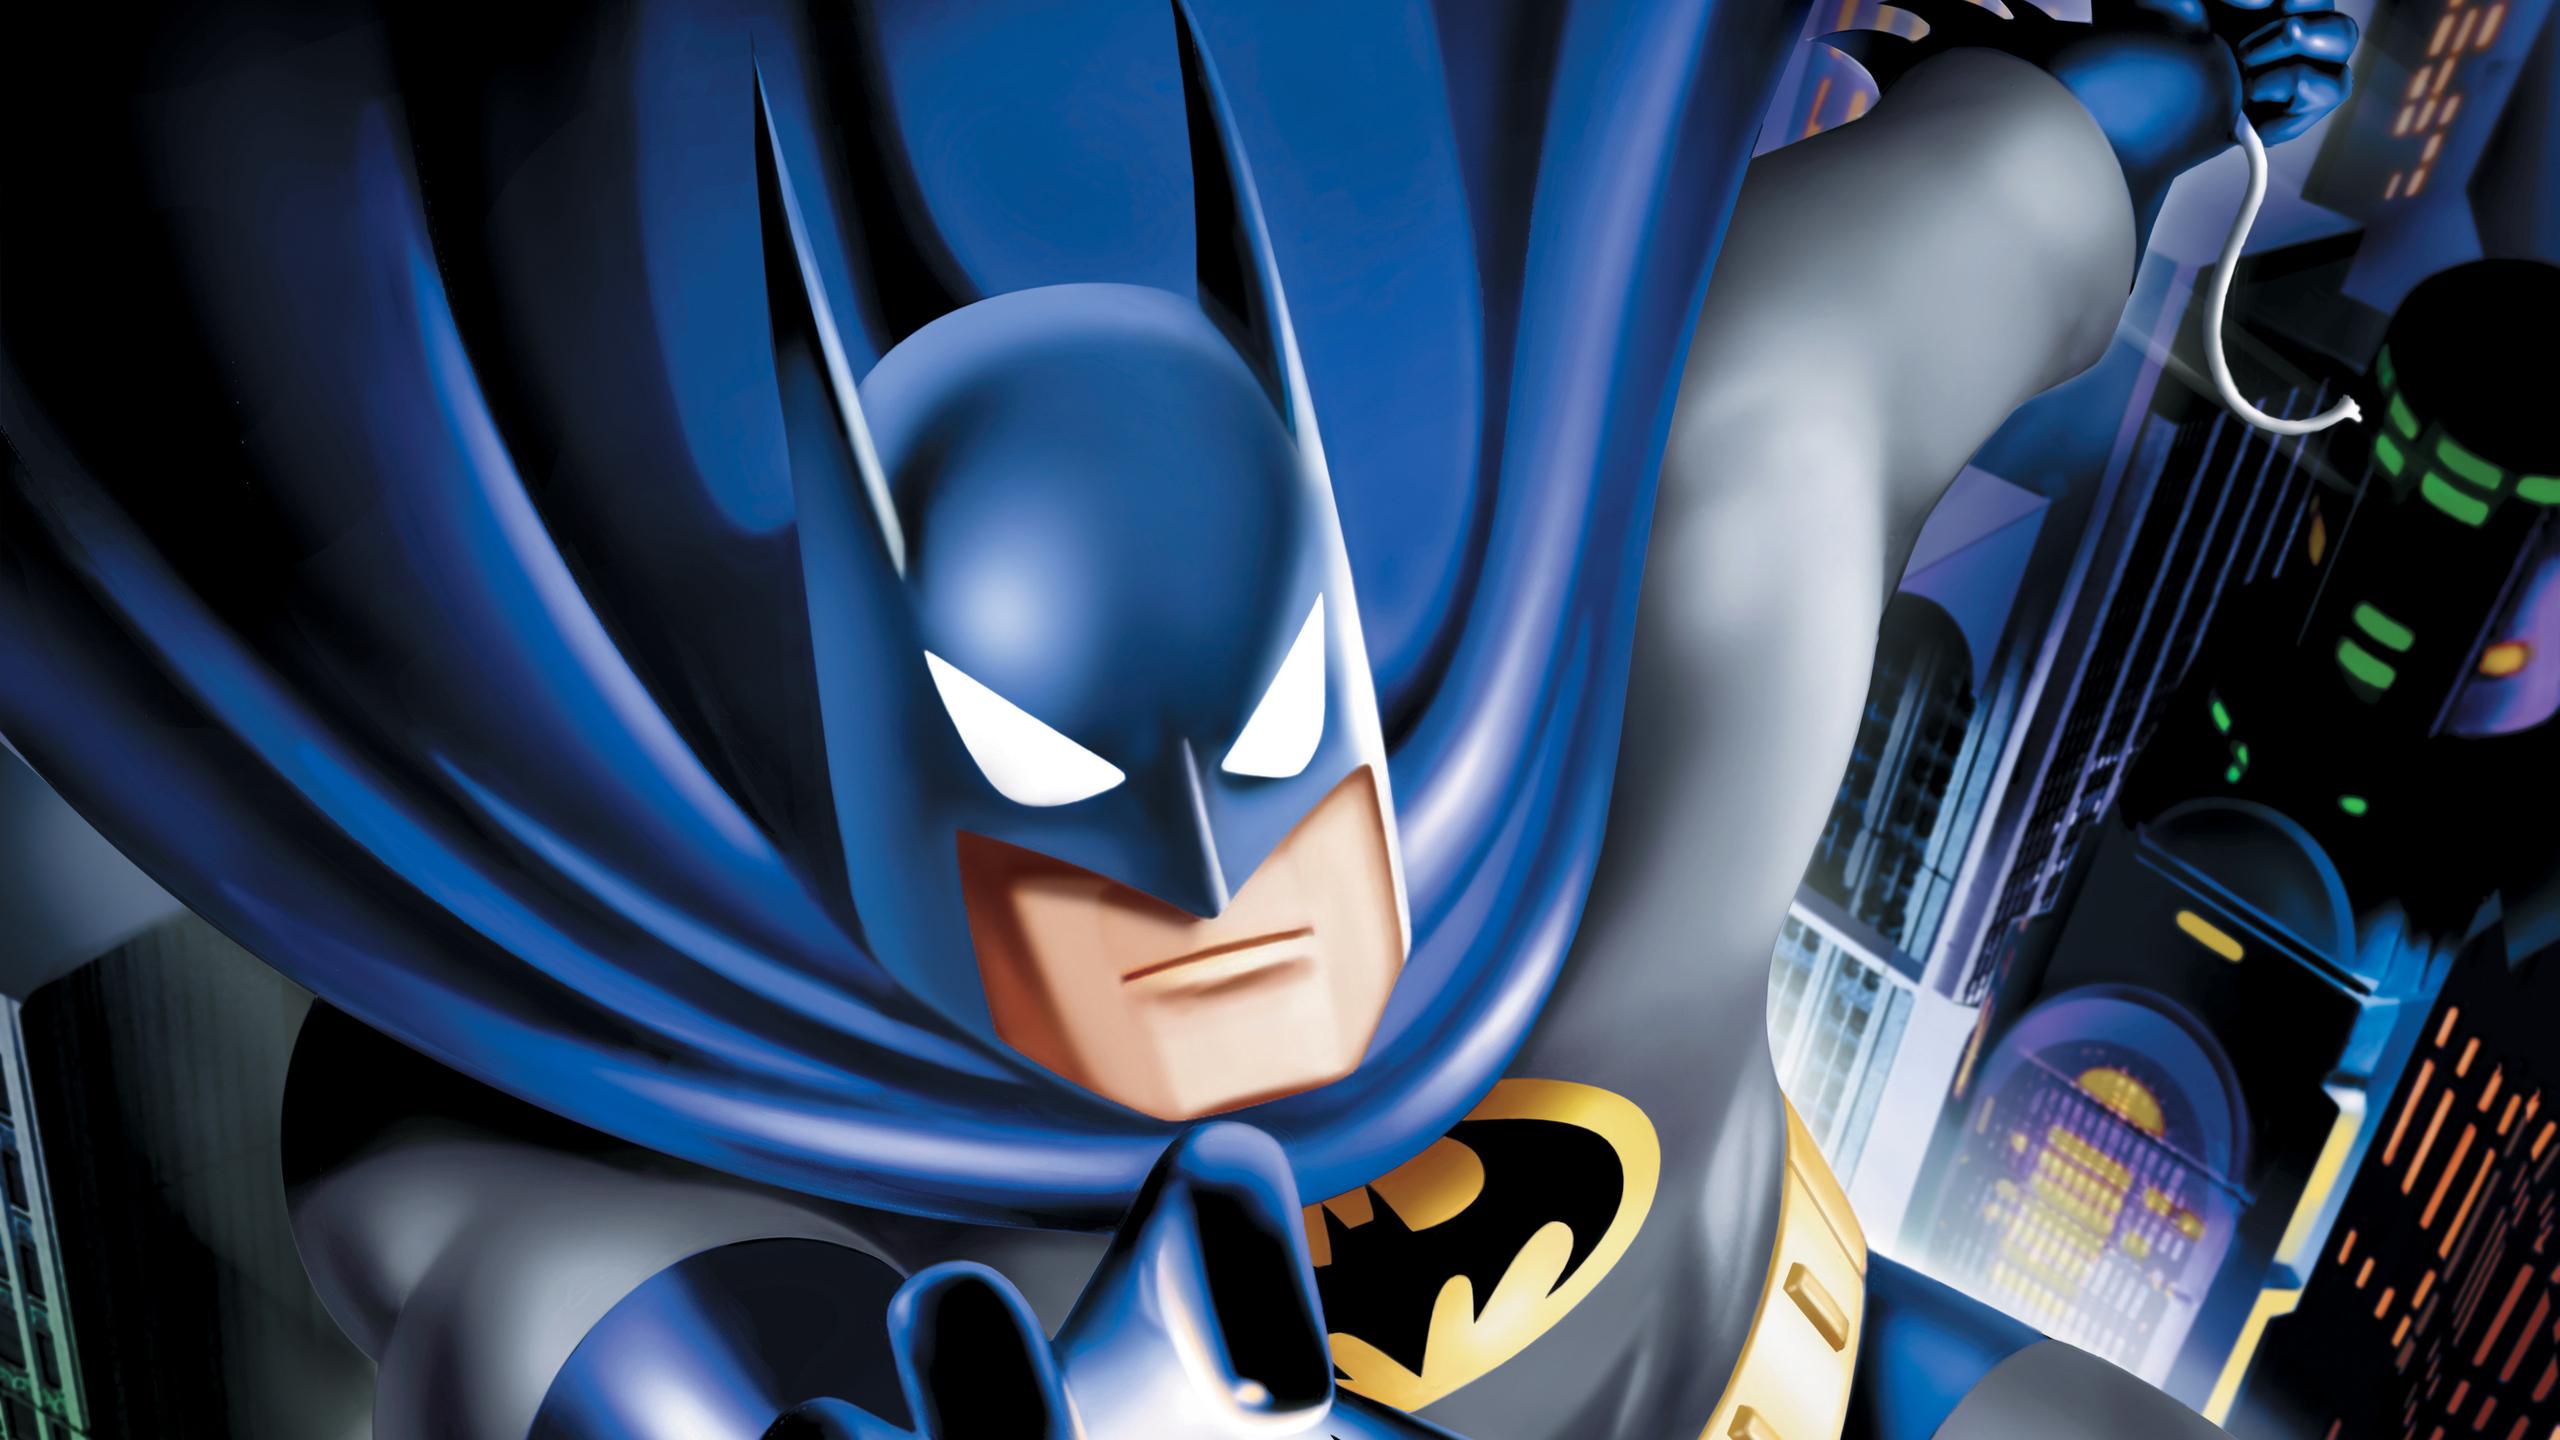 2560x1440 Batman The Animated Series 4k 1440p Resolution Hd